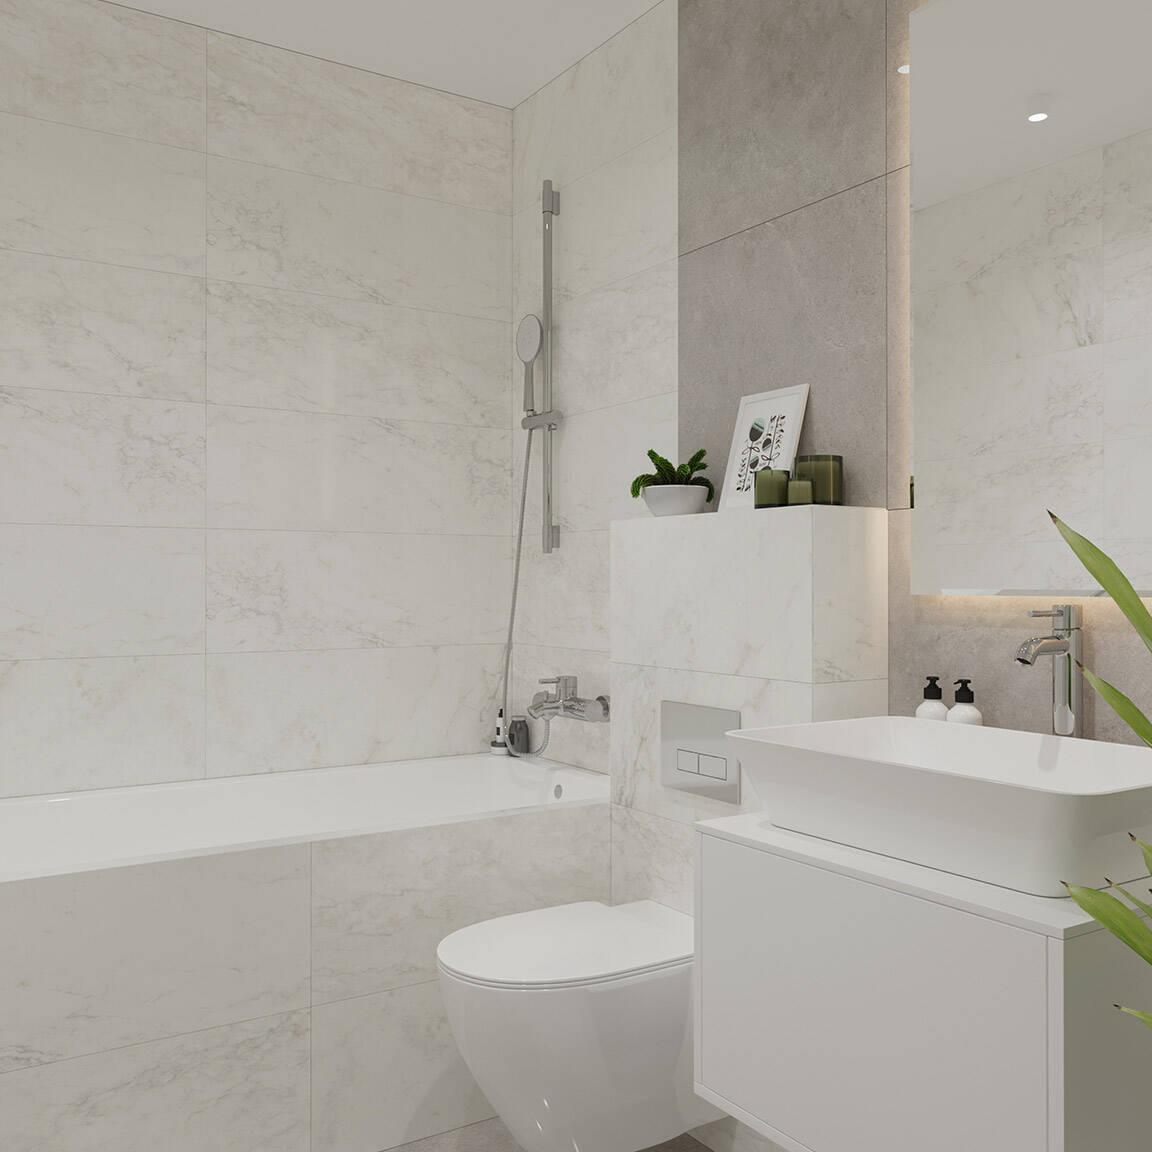 Catedral Residence - Bathroom - Marazzi Ceramic tiles - 9